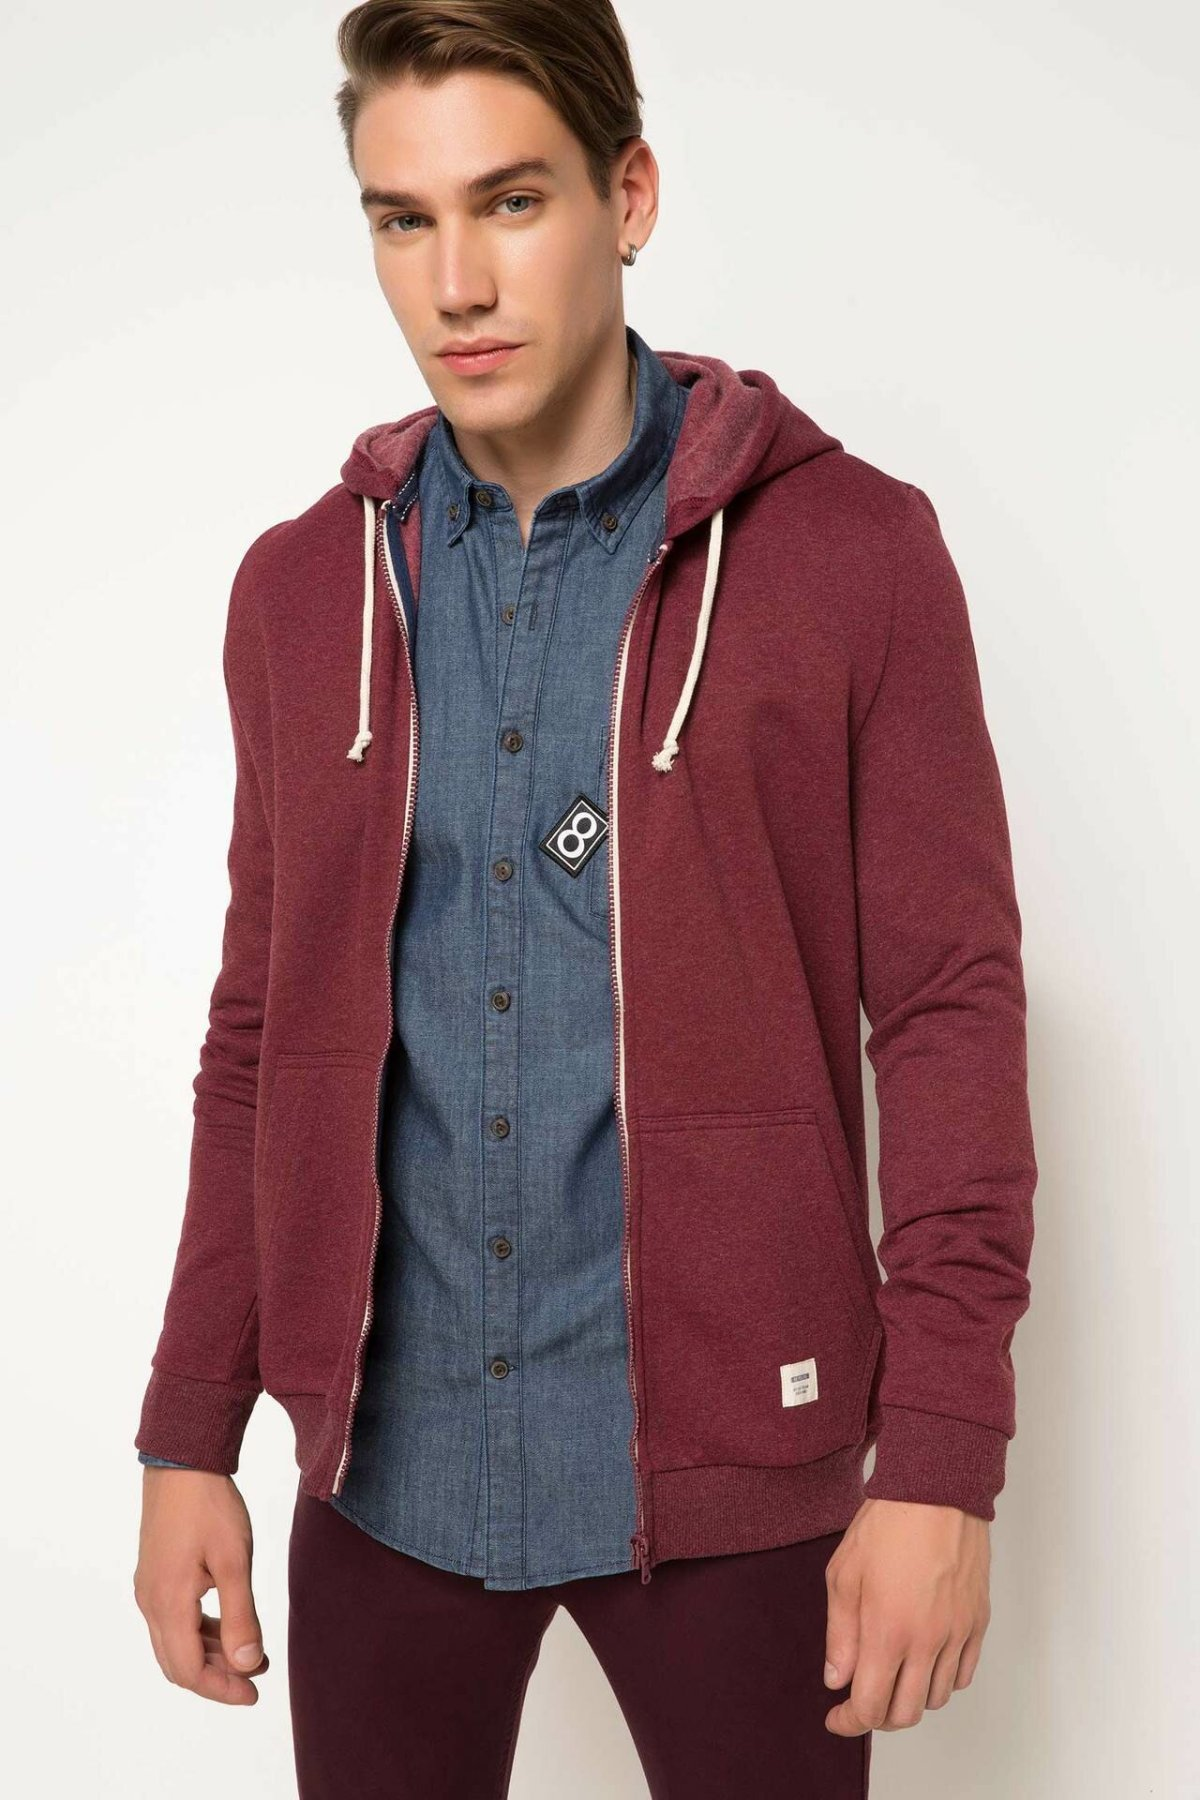 DeFacto Man Autumn Spring Casual Long Sleeve Cardigan Coats/ Men Solid Color Hoodies Bolero-G0175AZ17AU